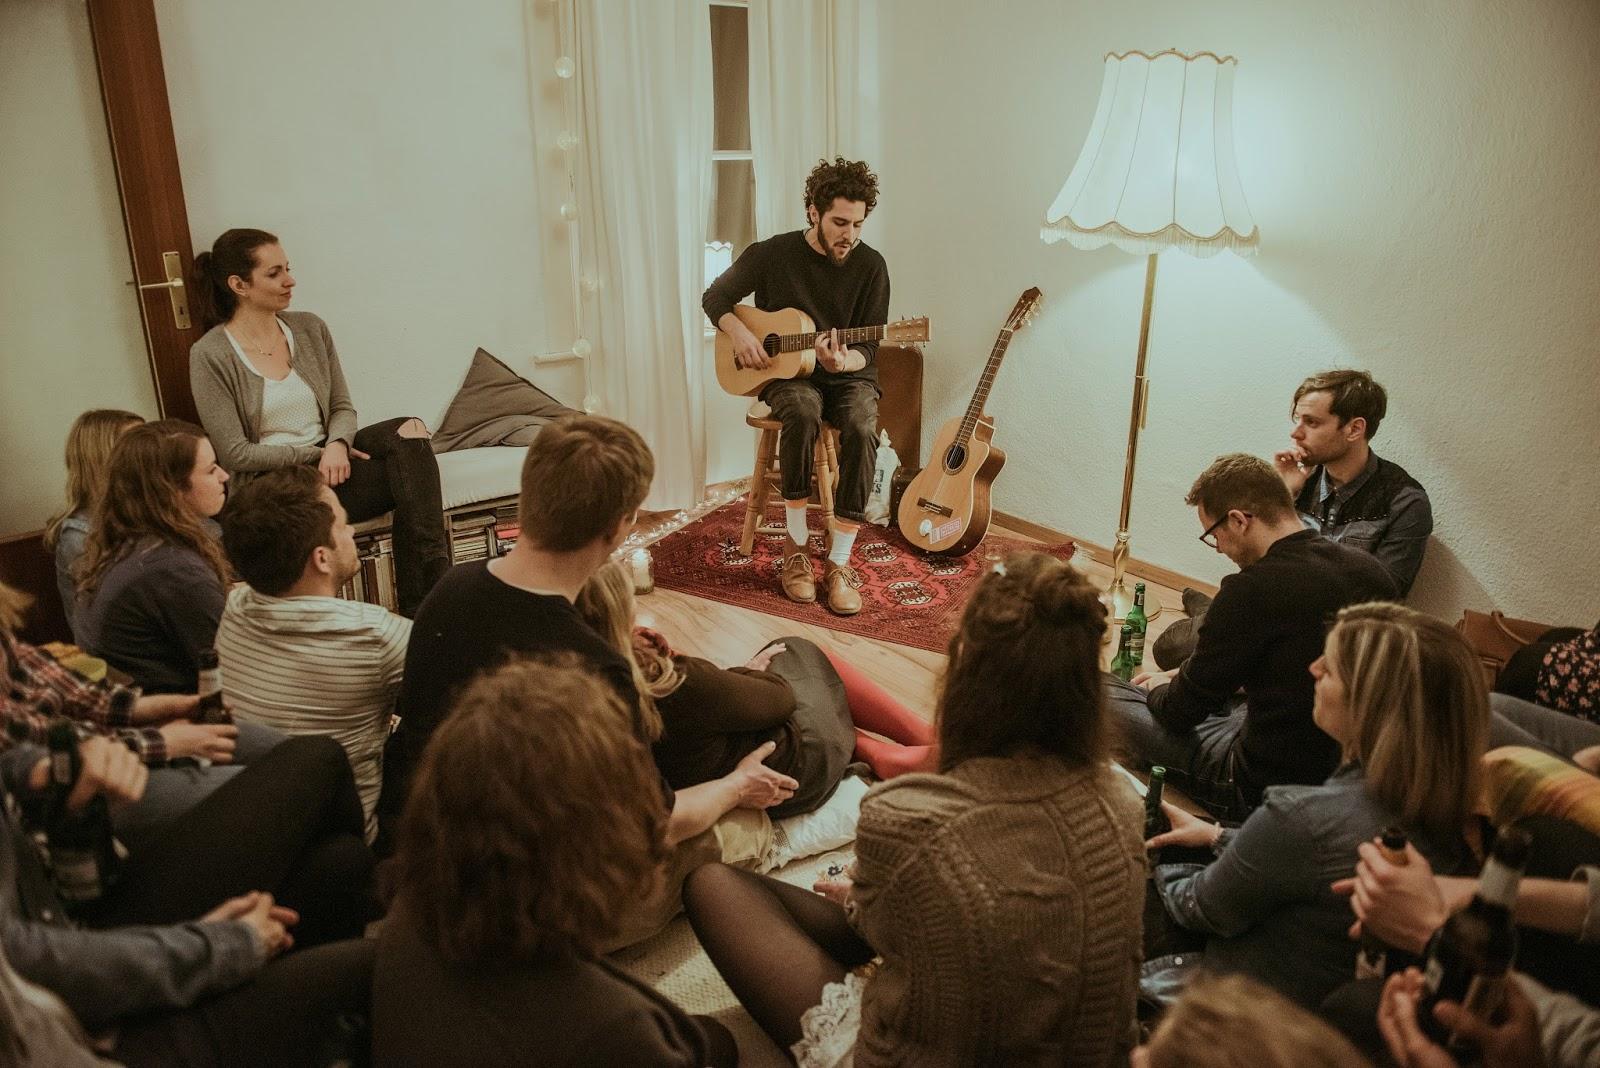 SofaConcerts 5 Reasons For Hosting A Sofa Concert